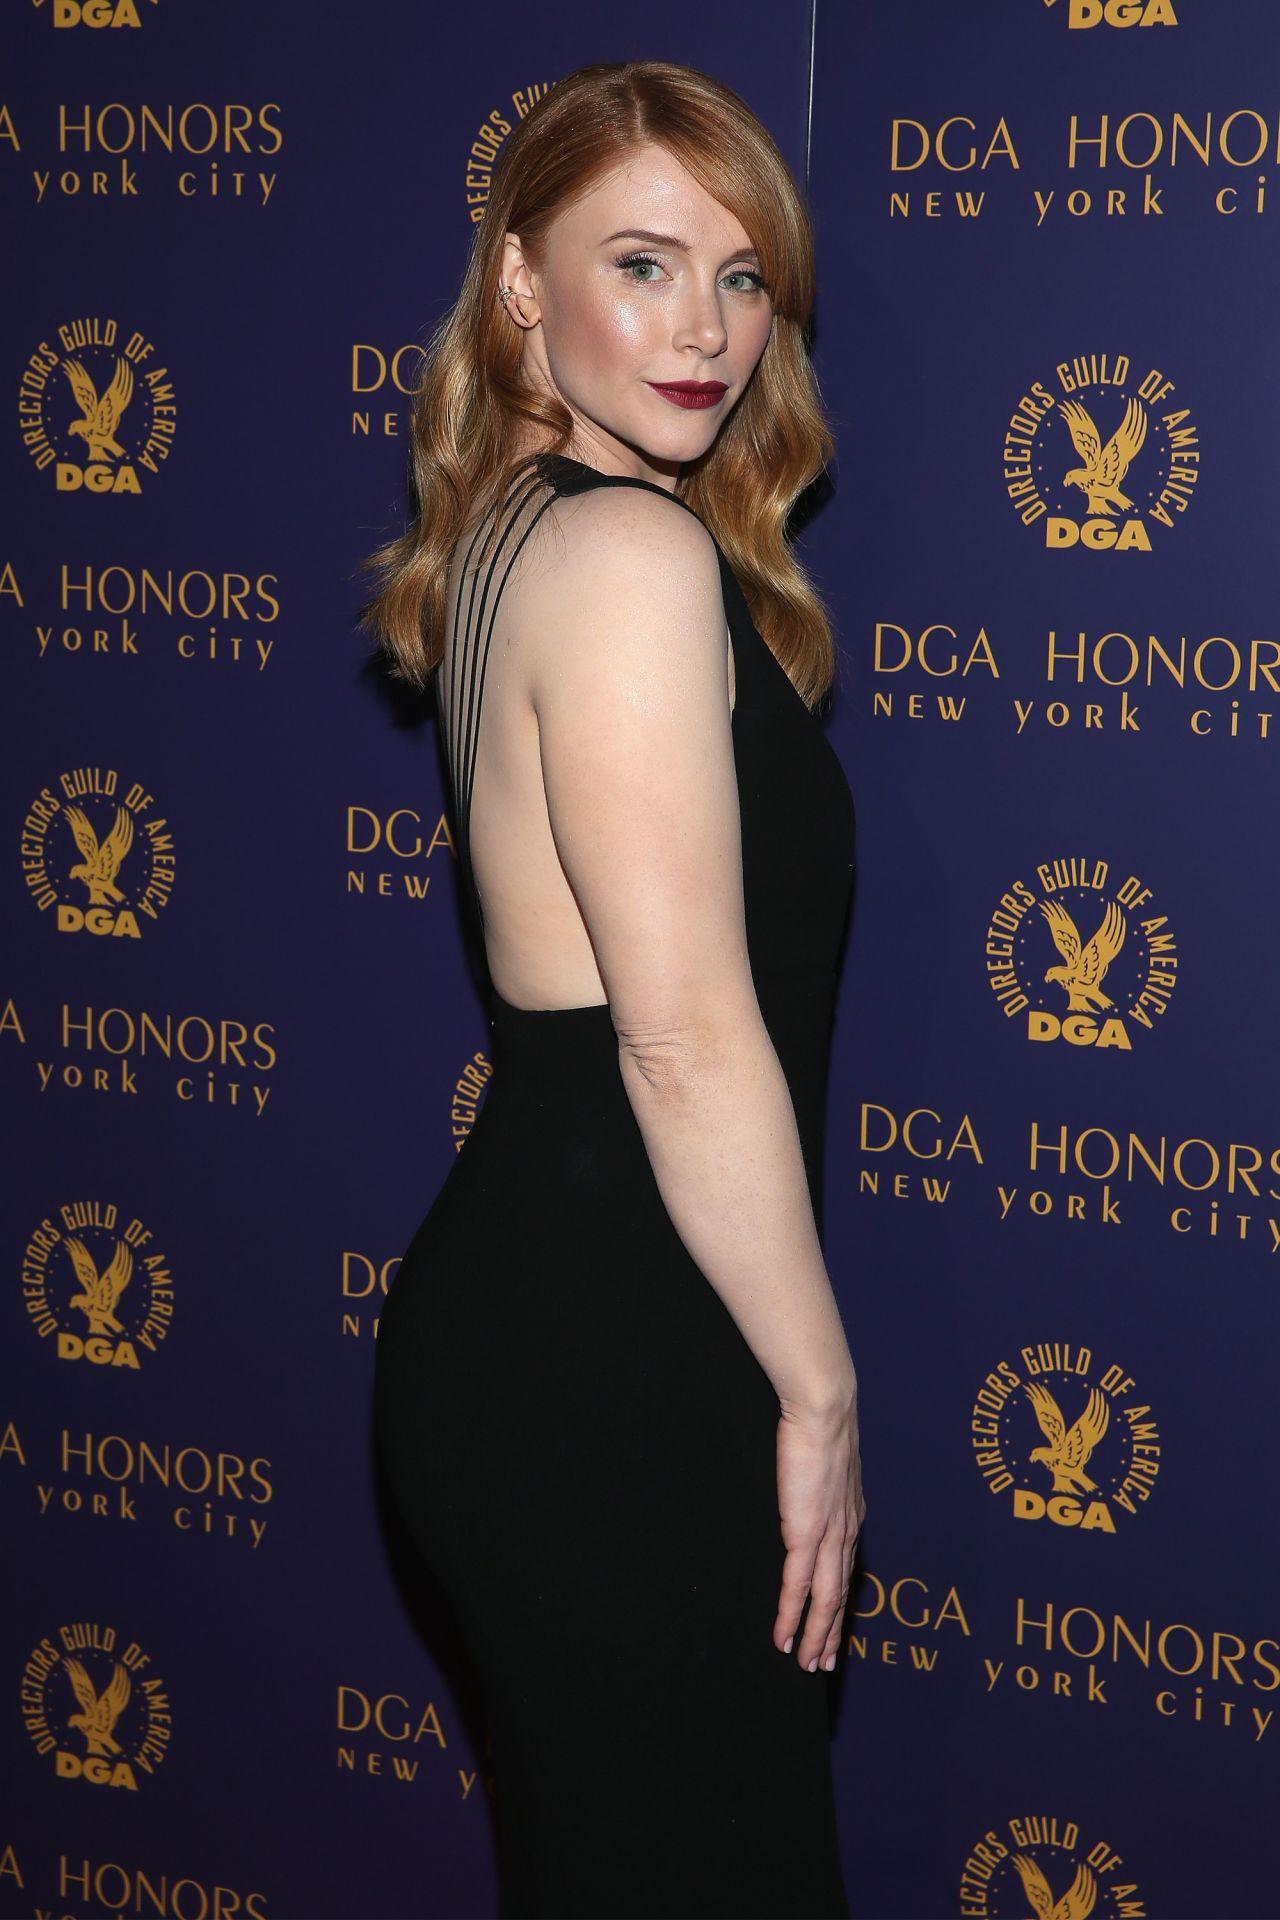 Bryce Dallas Howard Dga Honors 2015 Gala In New York City